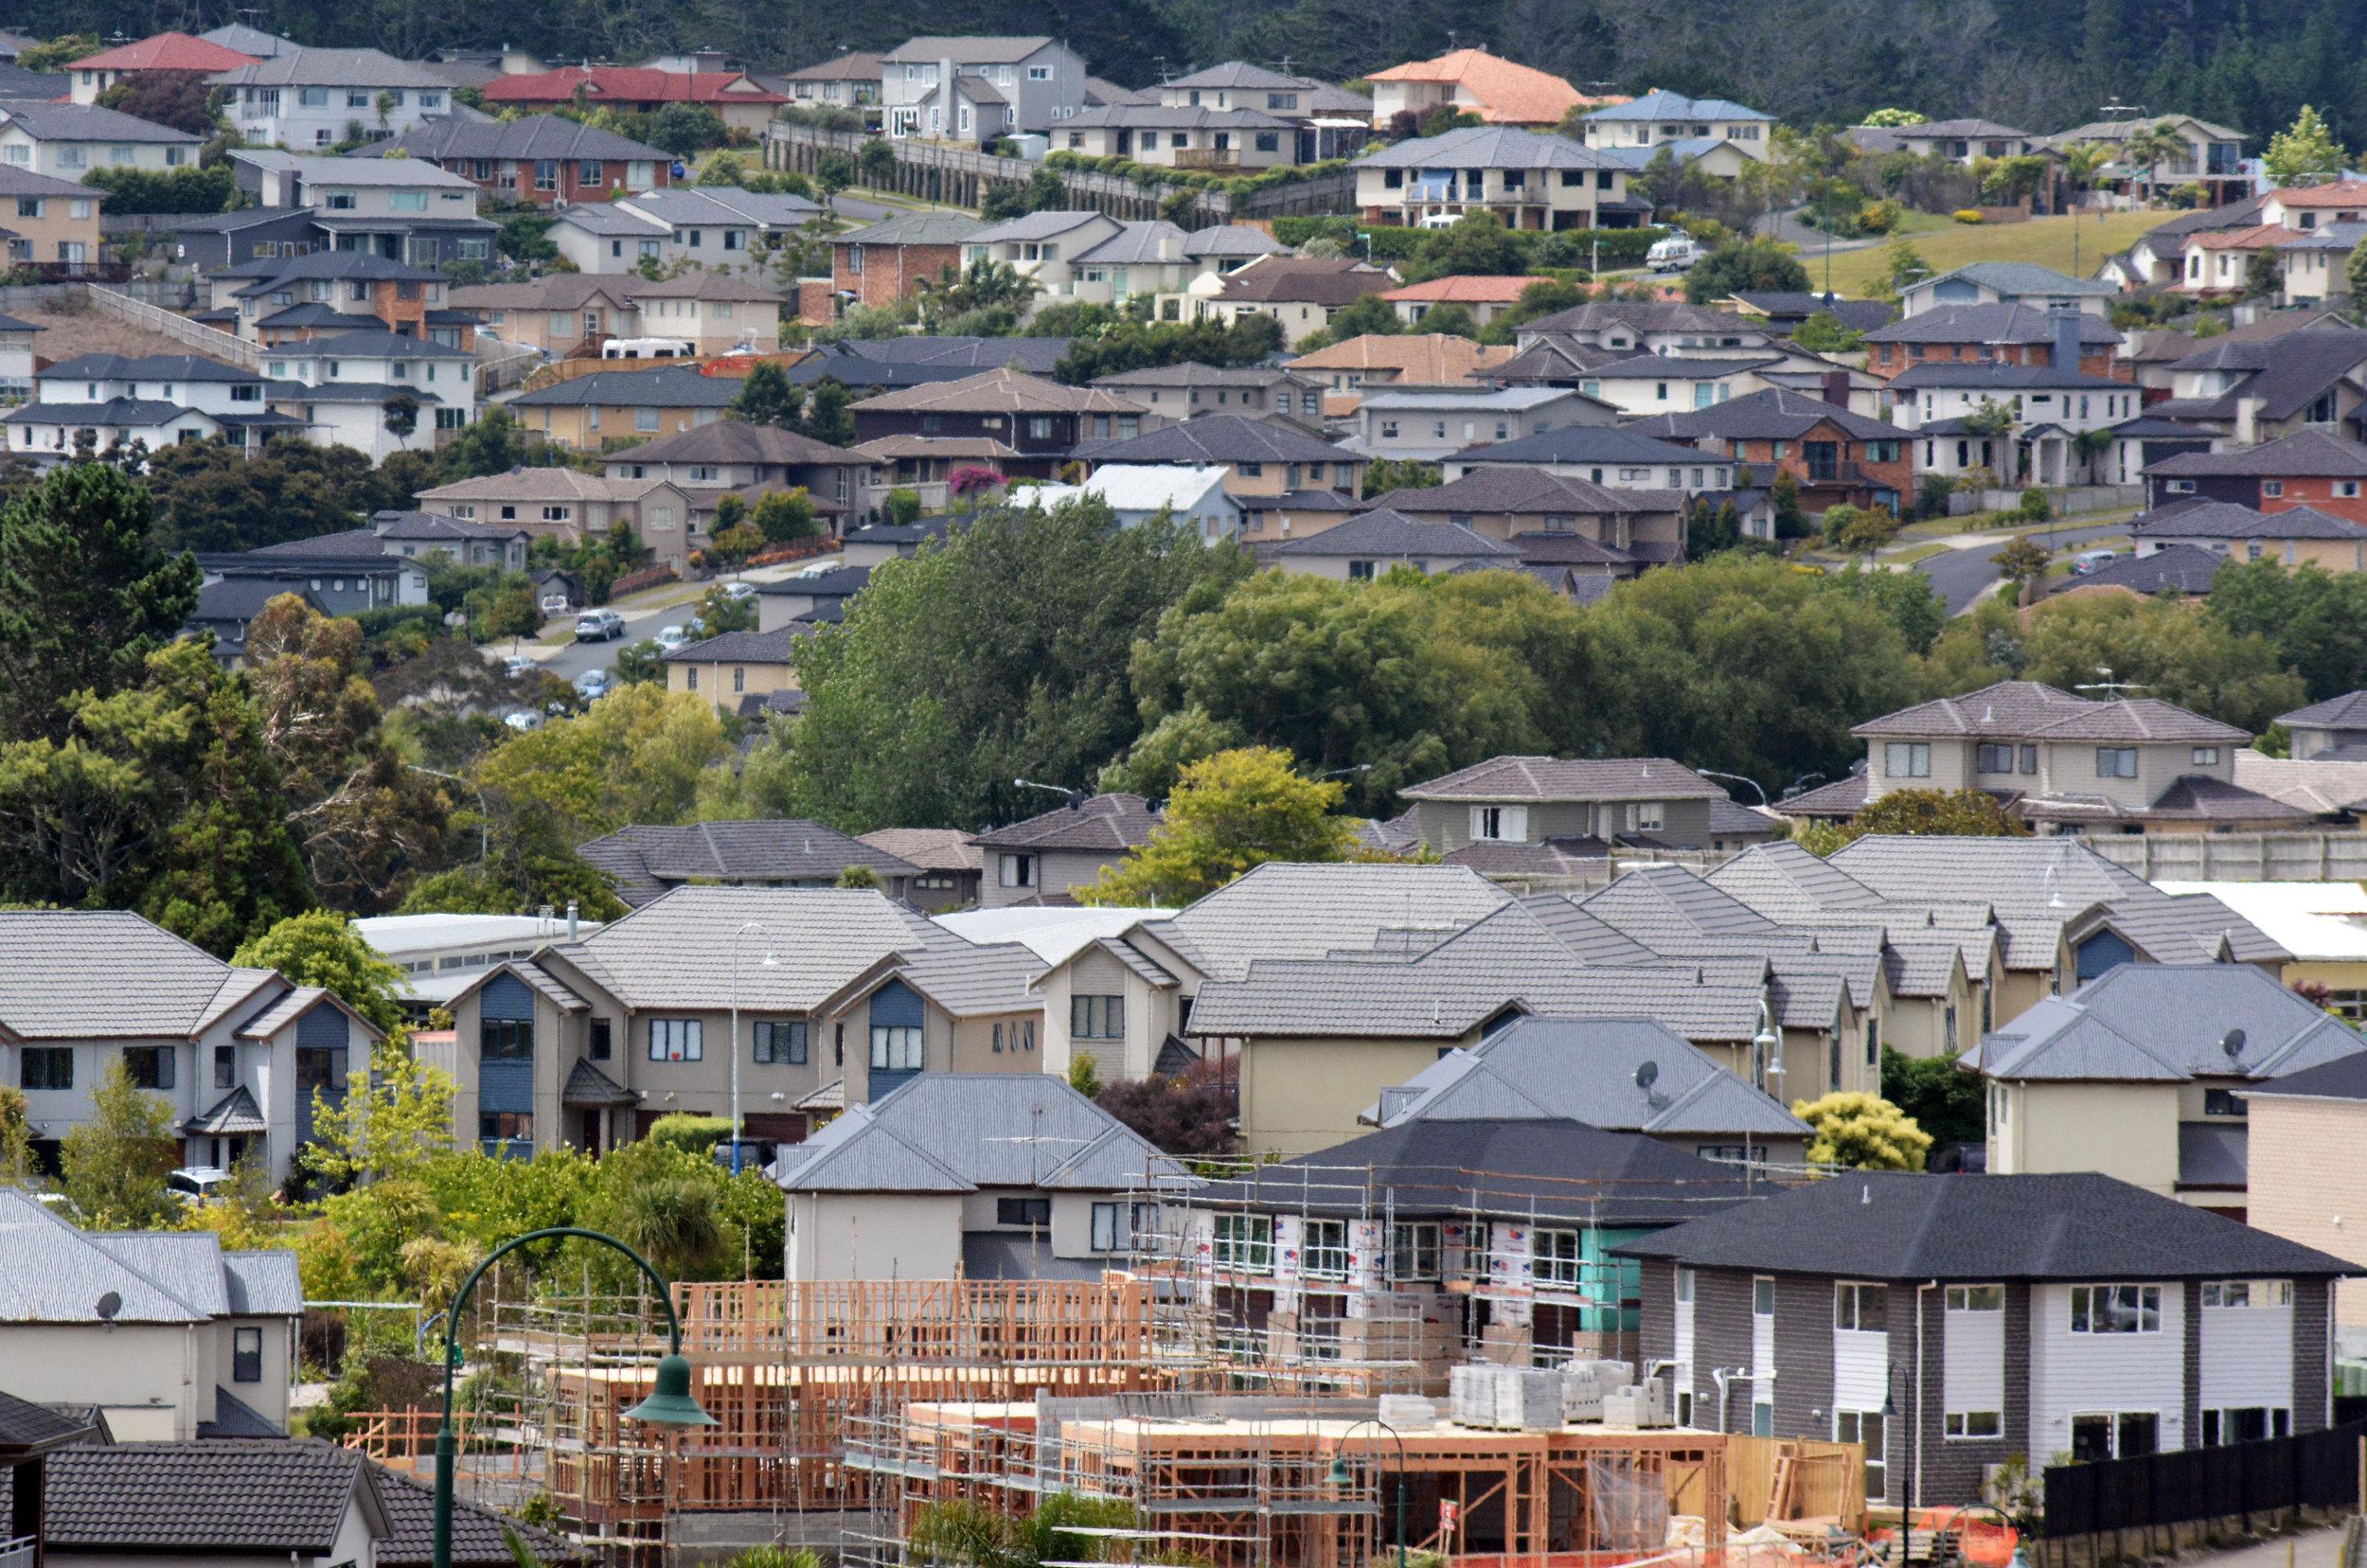 I19_New-Zealand-Housing-Property-and-Real-Estate-Market-515707470_4928x3264.jpeg